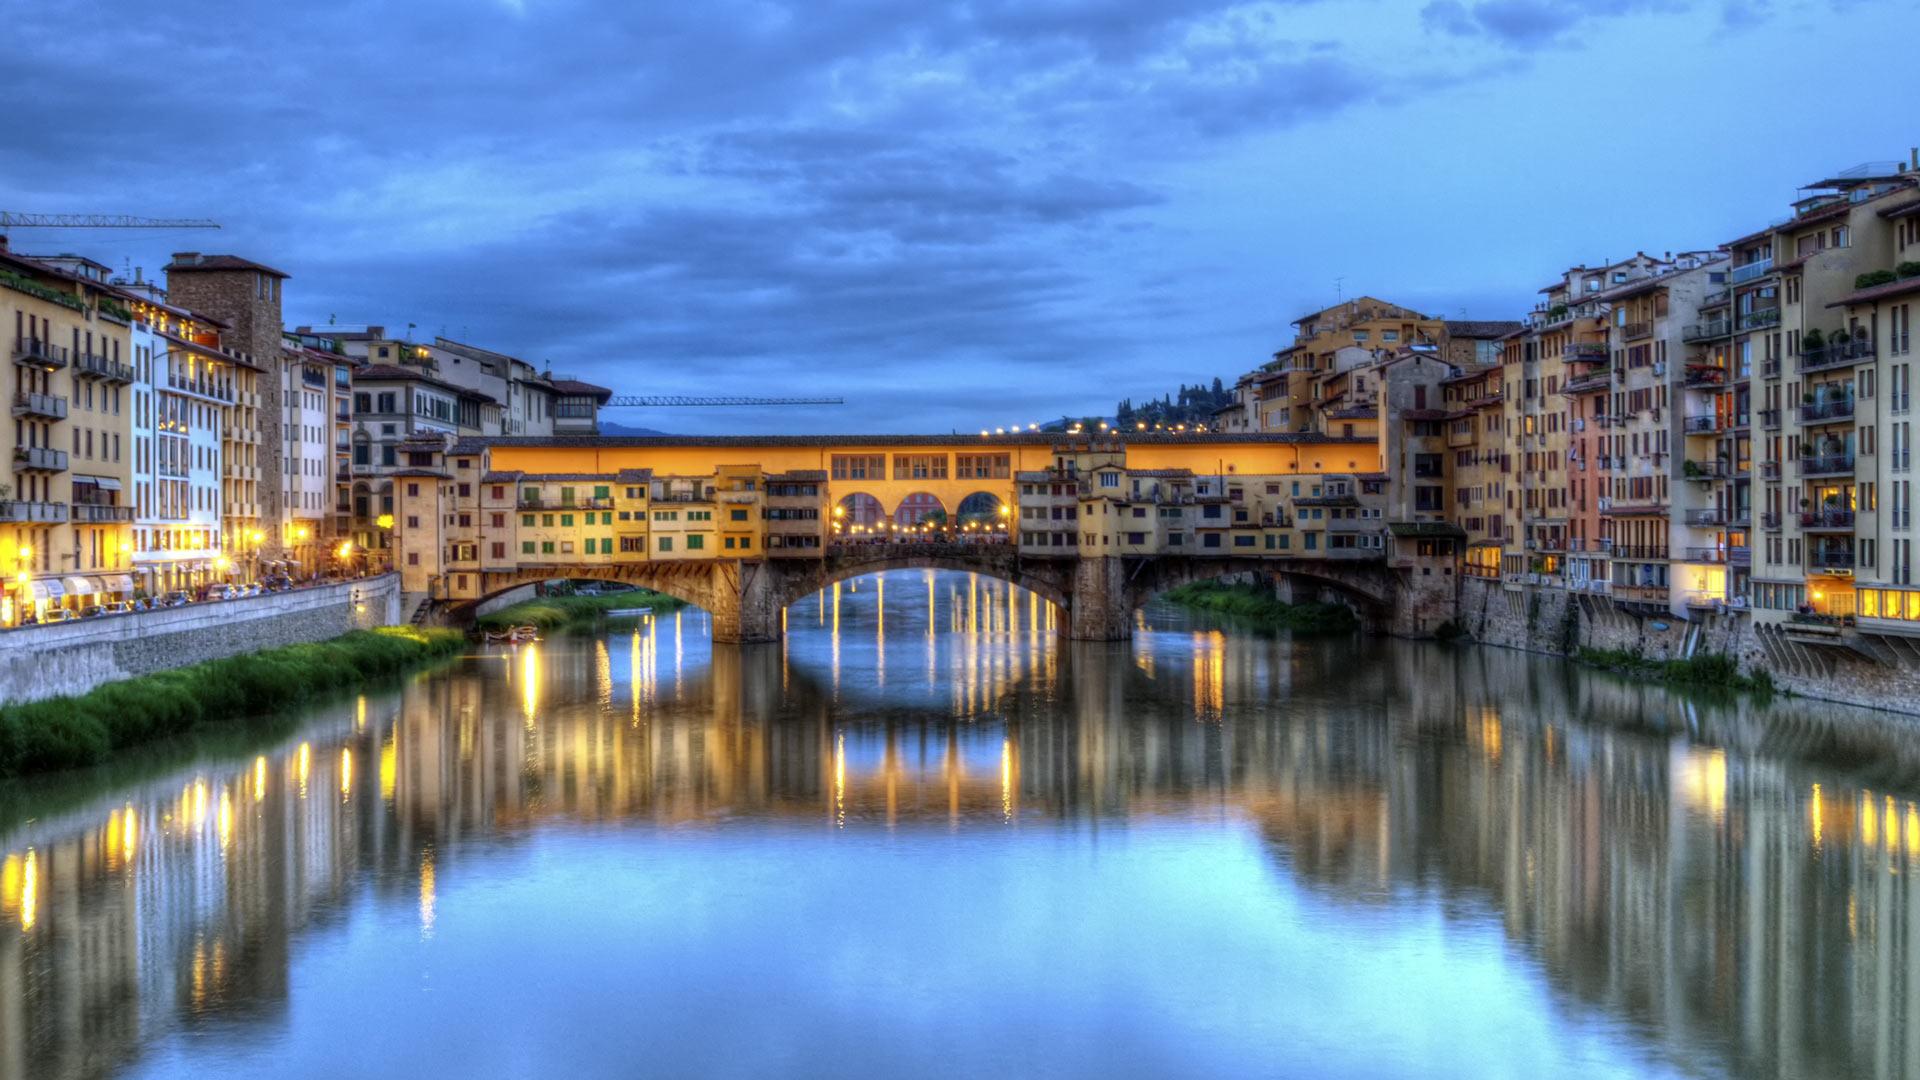 Ponte vecchio, Florence, Firenze, Italia